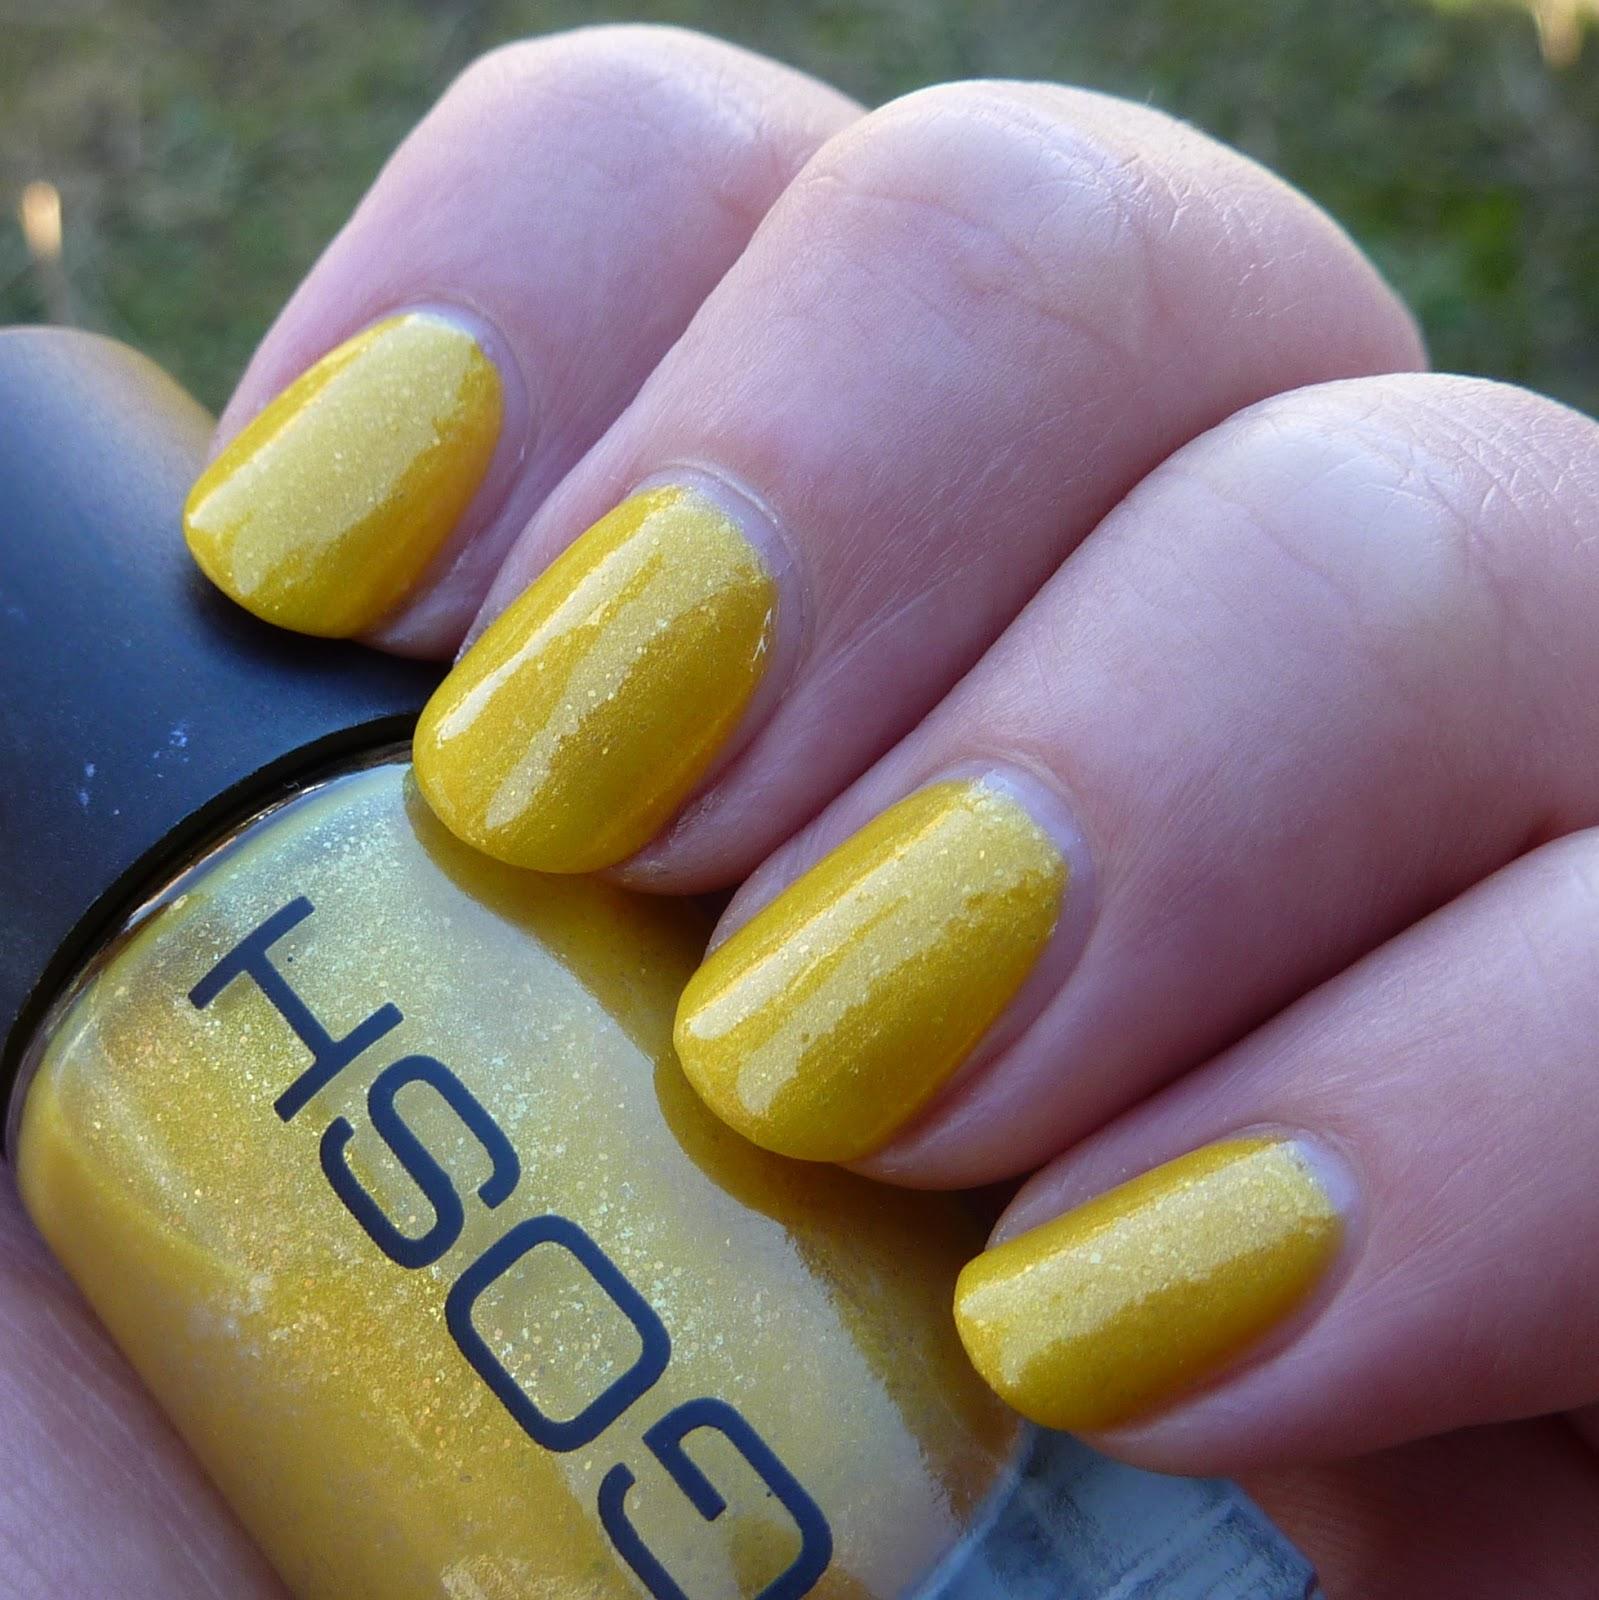 Yellow Nail Polish On: Polish, Plants & More....: Gosh